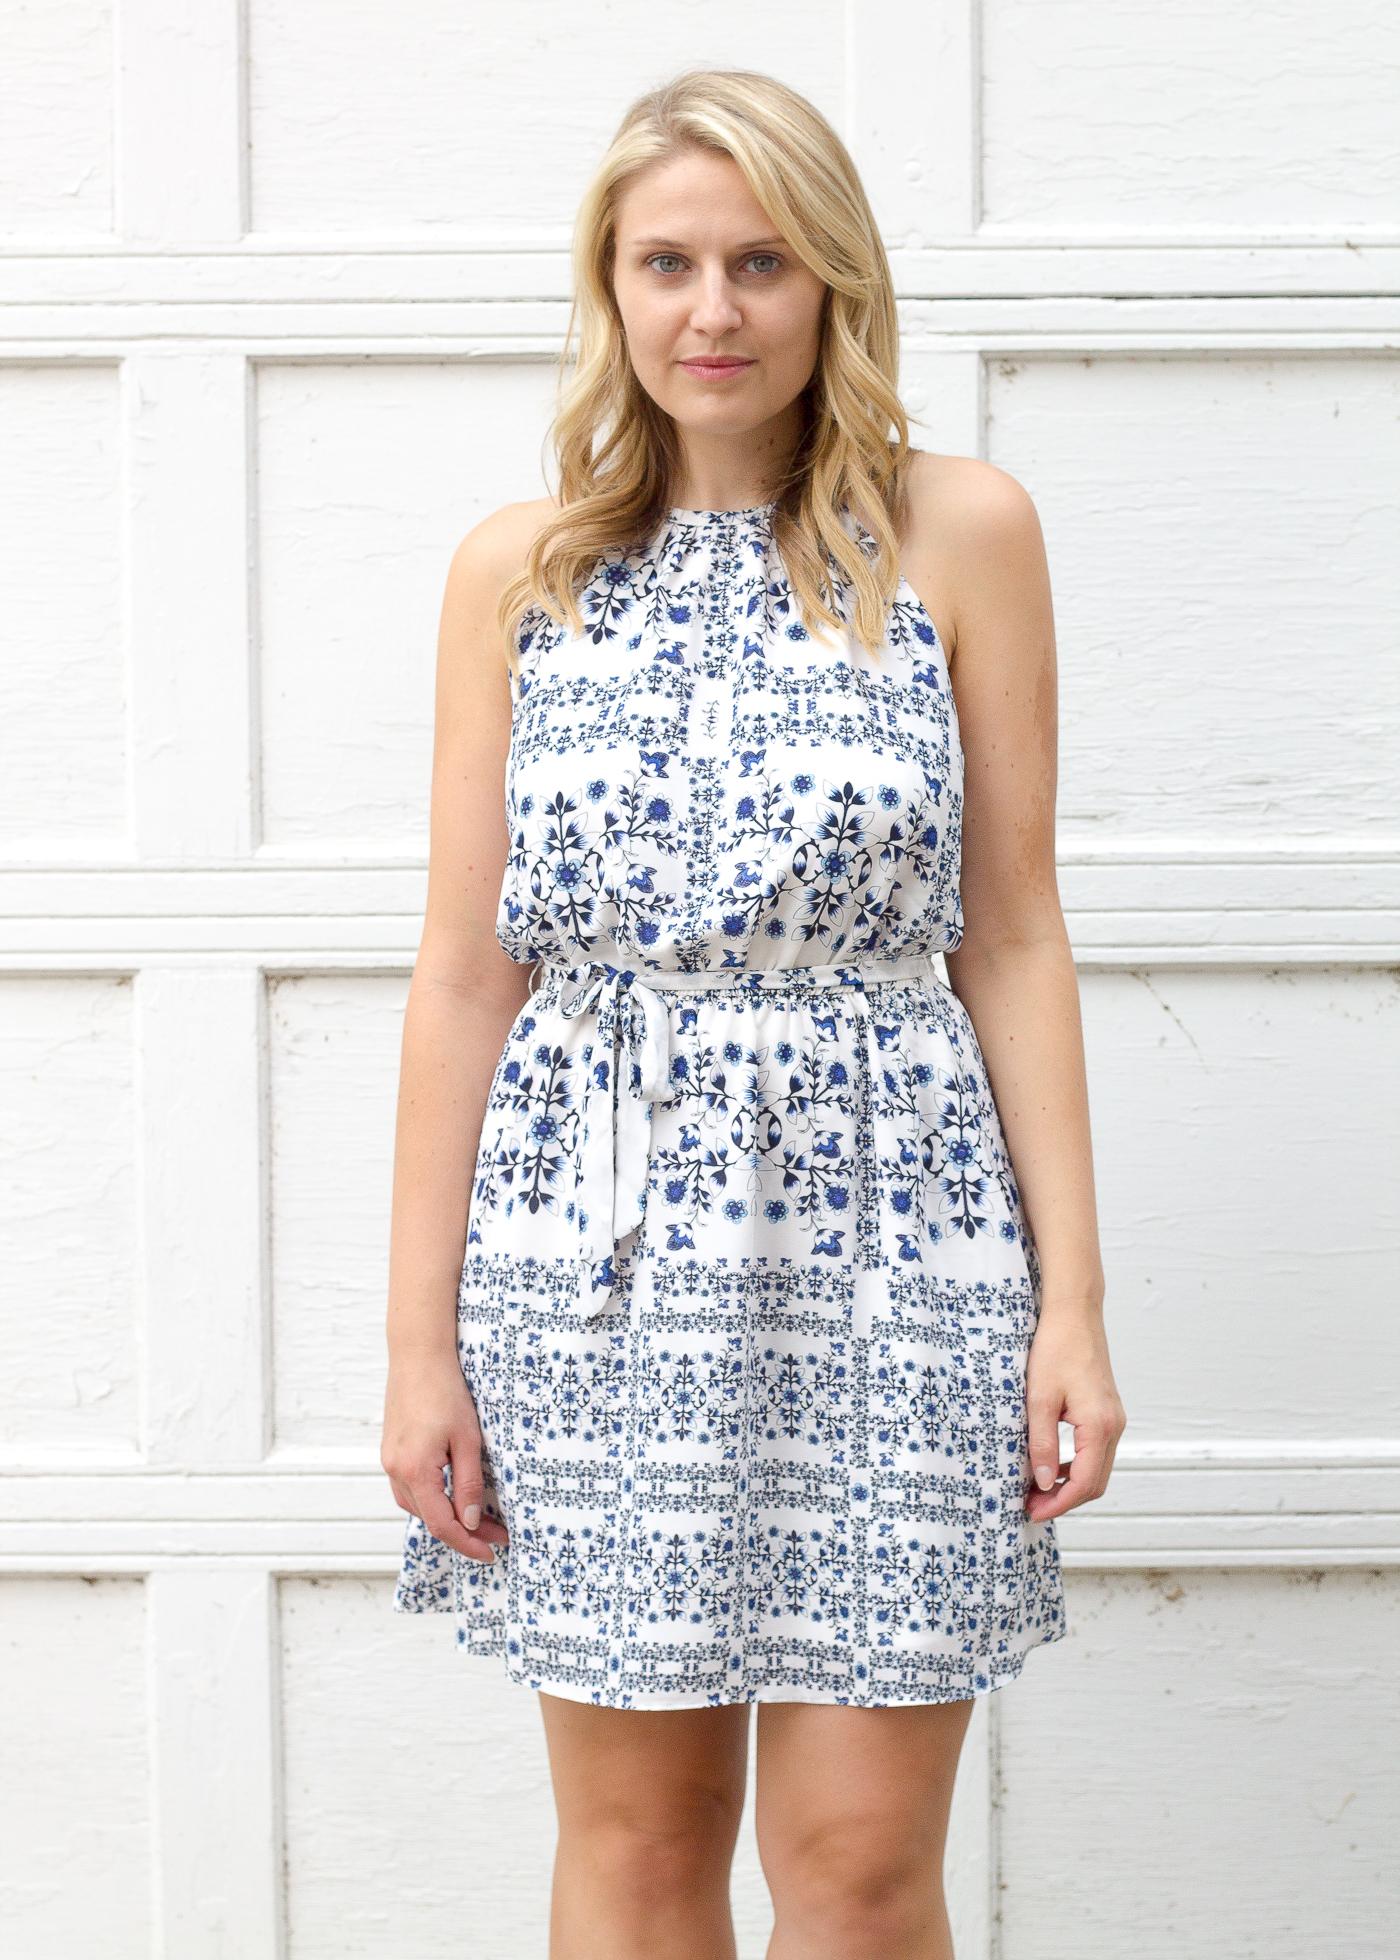 Aqua blue and white summer print dress